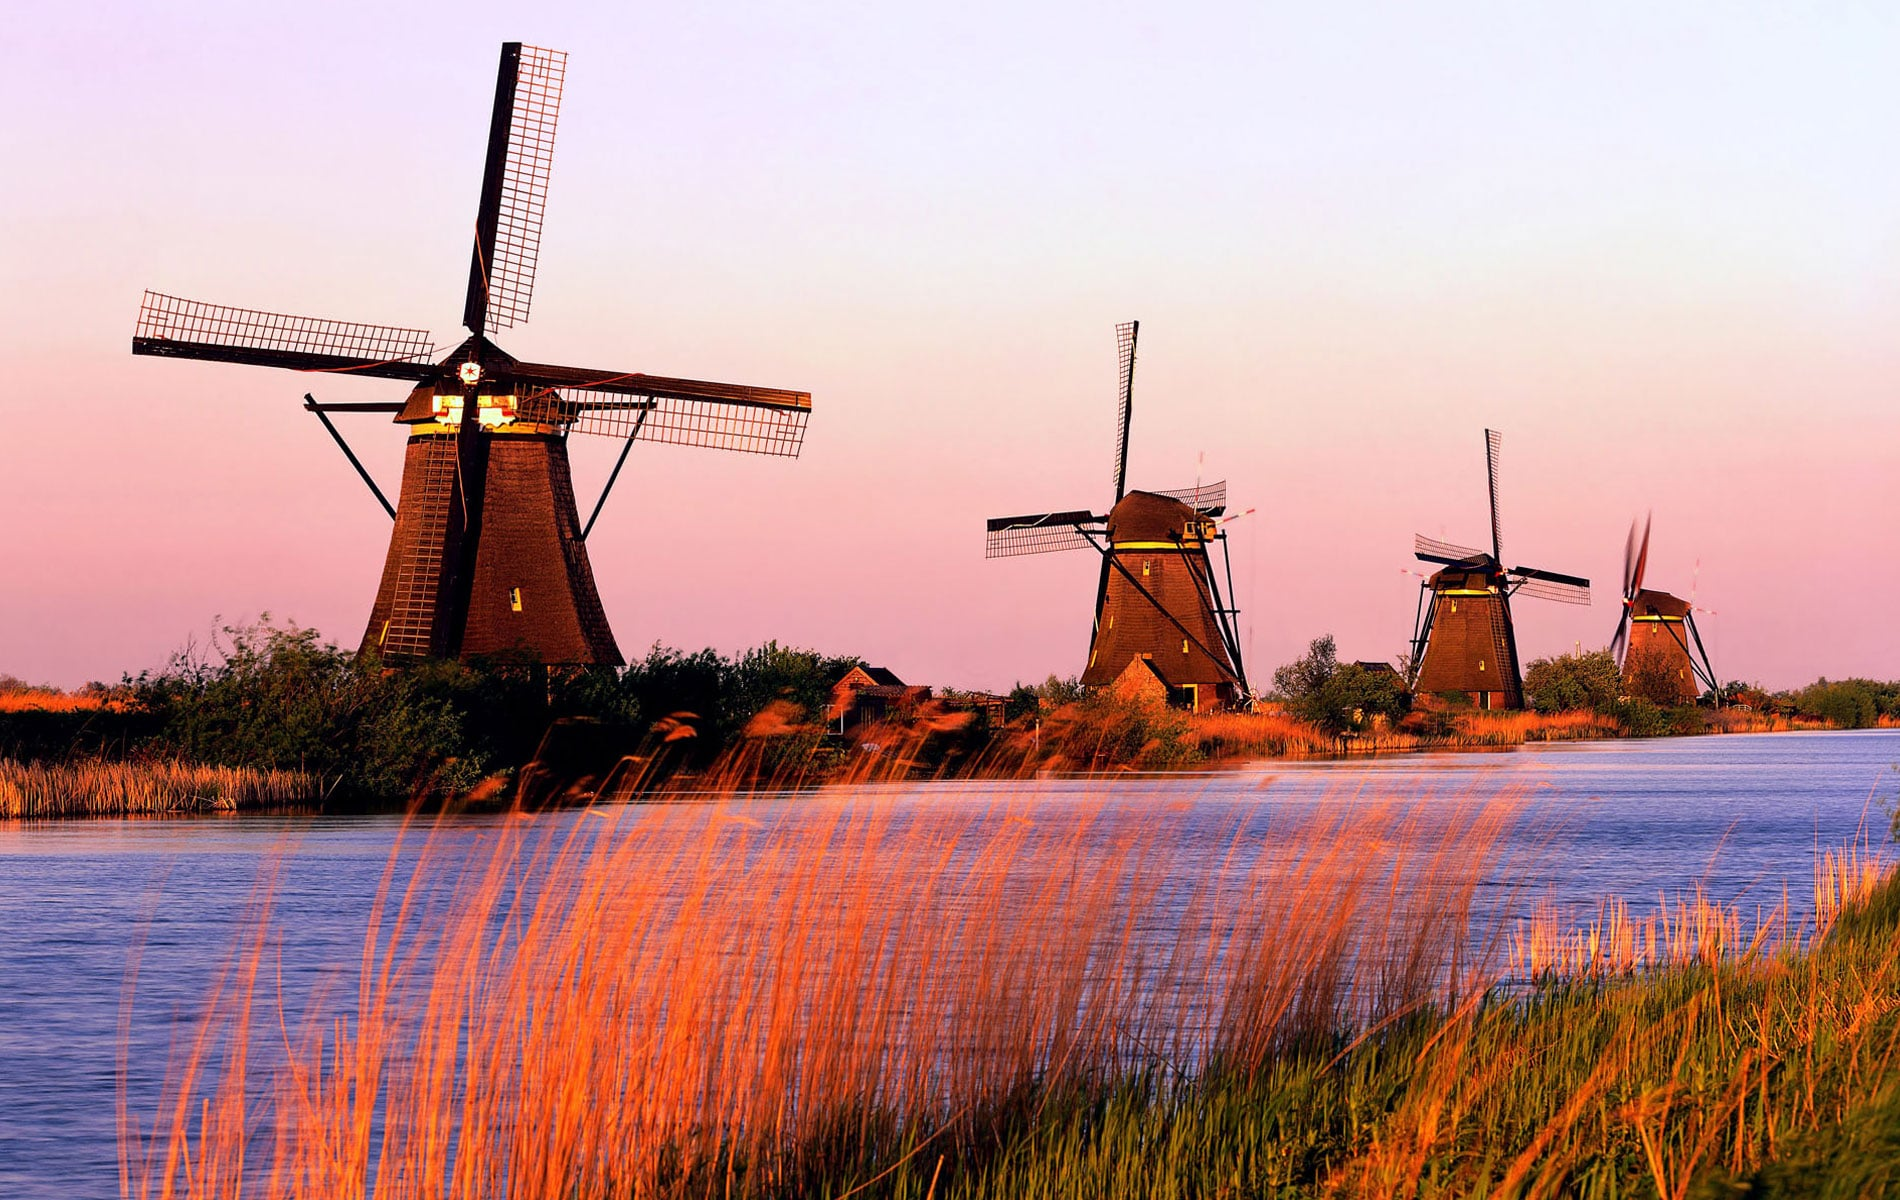 niederlande kinderdijke planktonholland